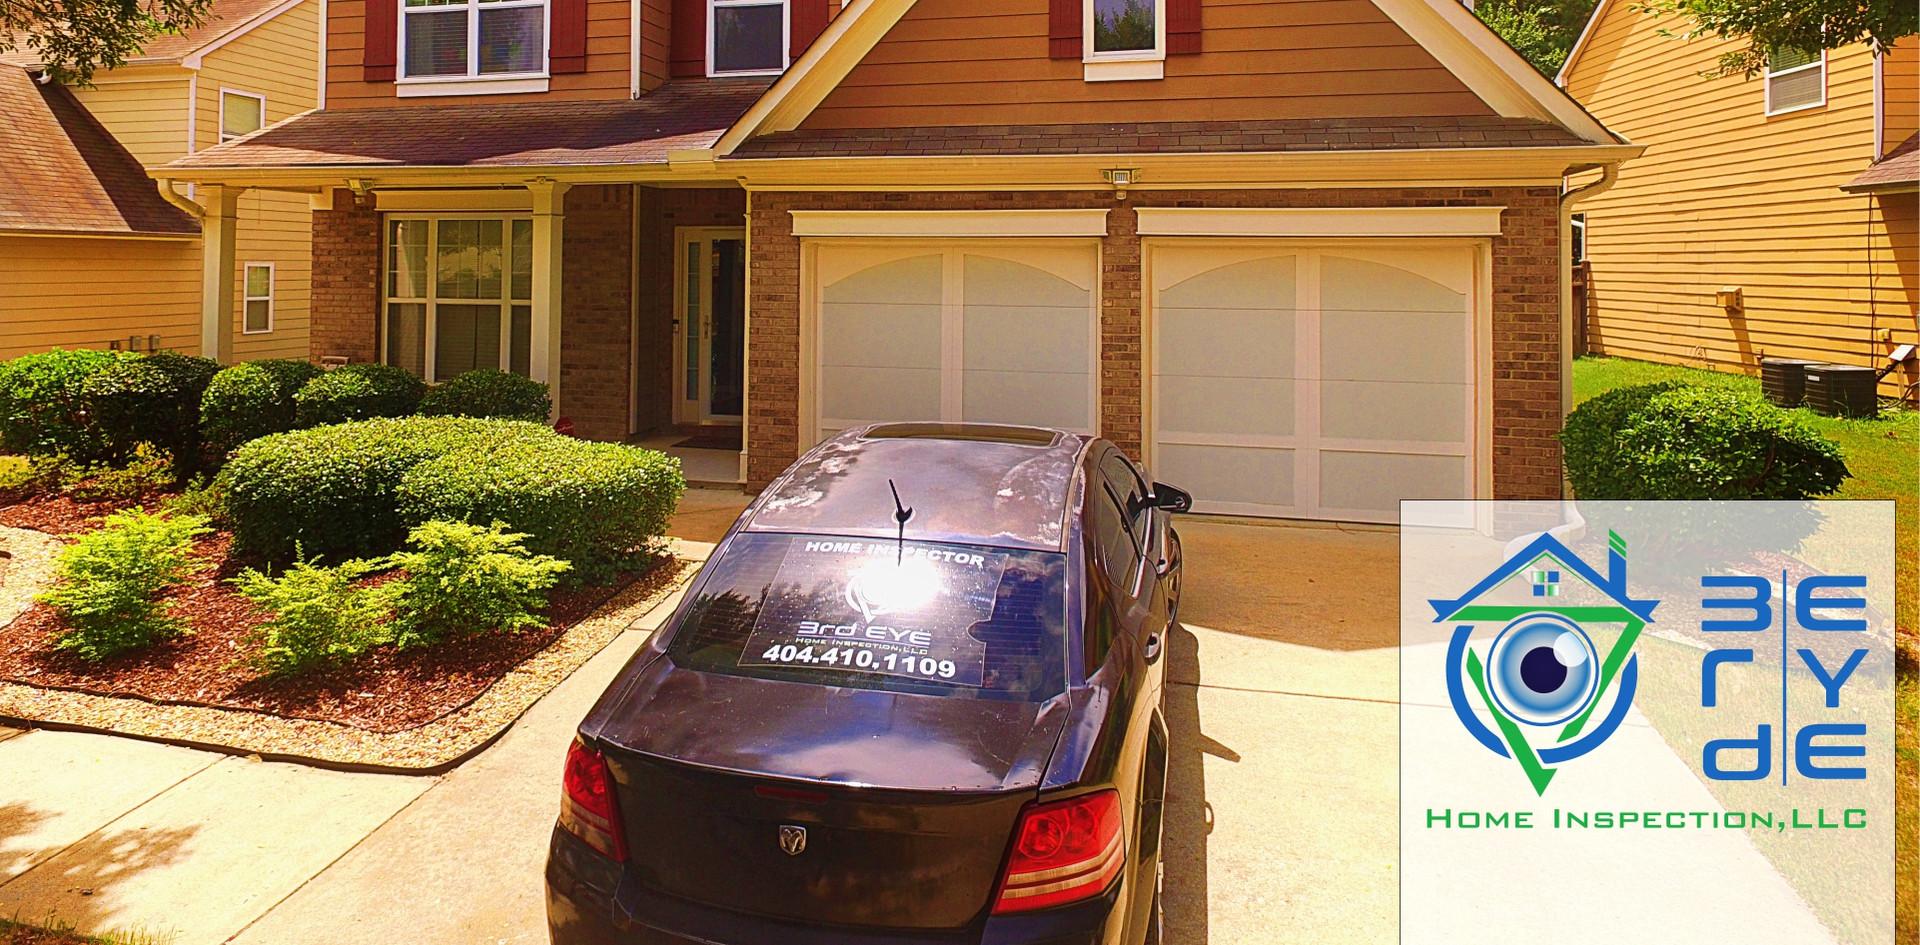 3727 Uppark Drive_ 3rd EYE Home Inspecti